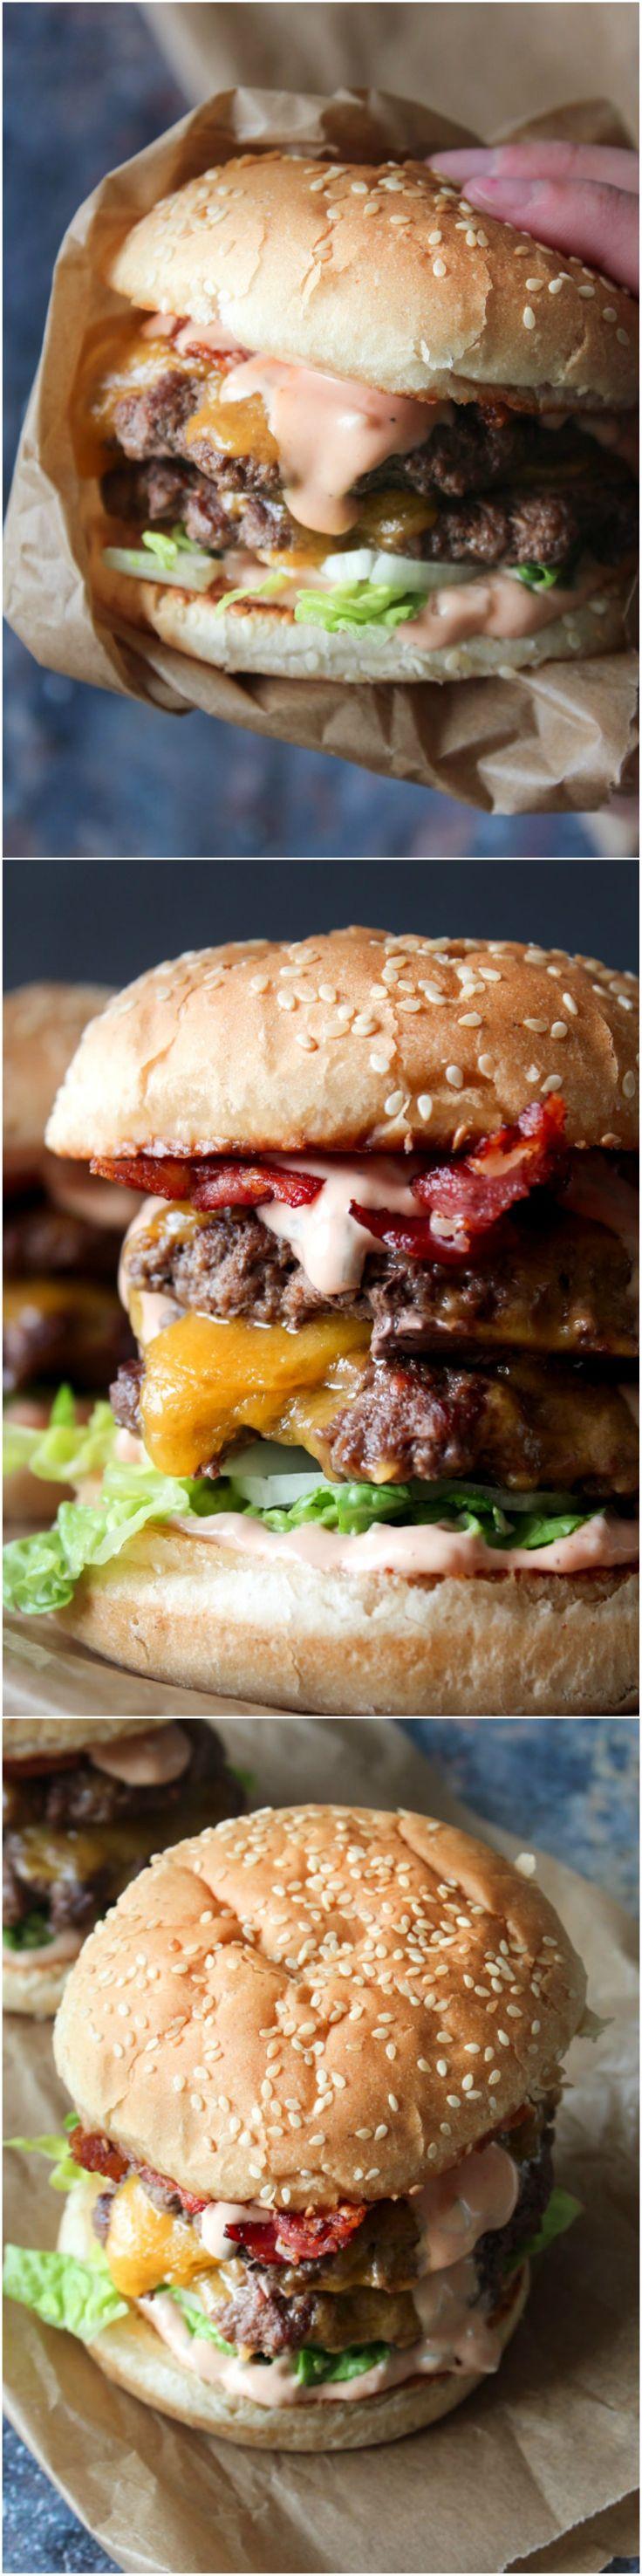 Homemade double cheeseburger with a homemade burger sauce - homemade big mac - easy dinner - homemade burger - homemade cheeseburger - bacon recipe